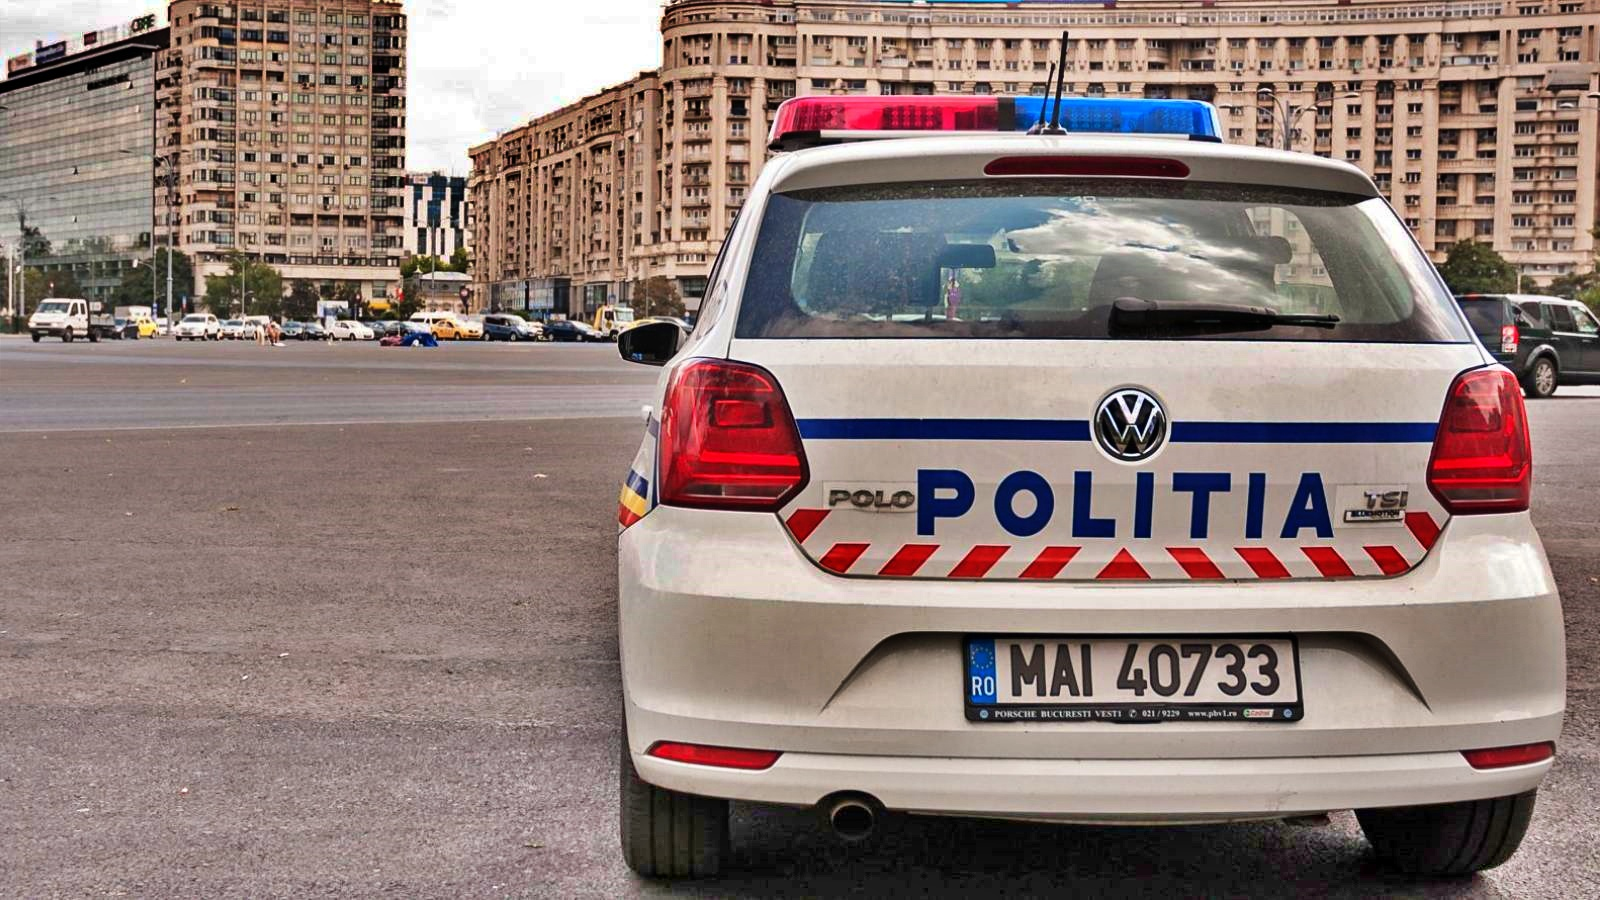 Politia Romana Mesaj Atentionare Pasagerii Masini